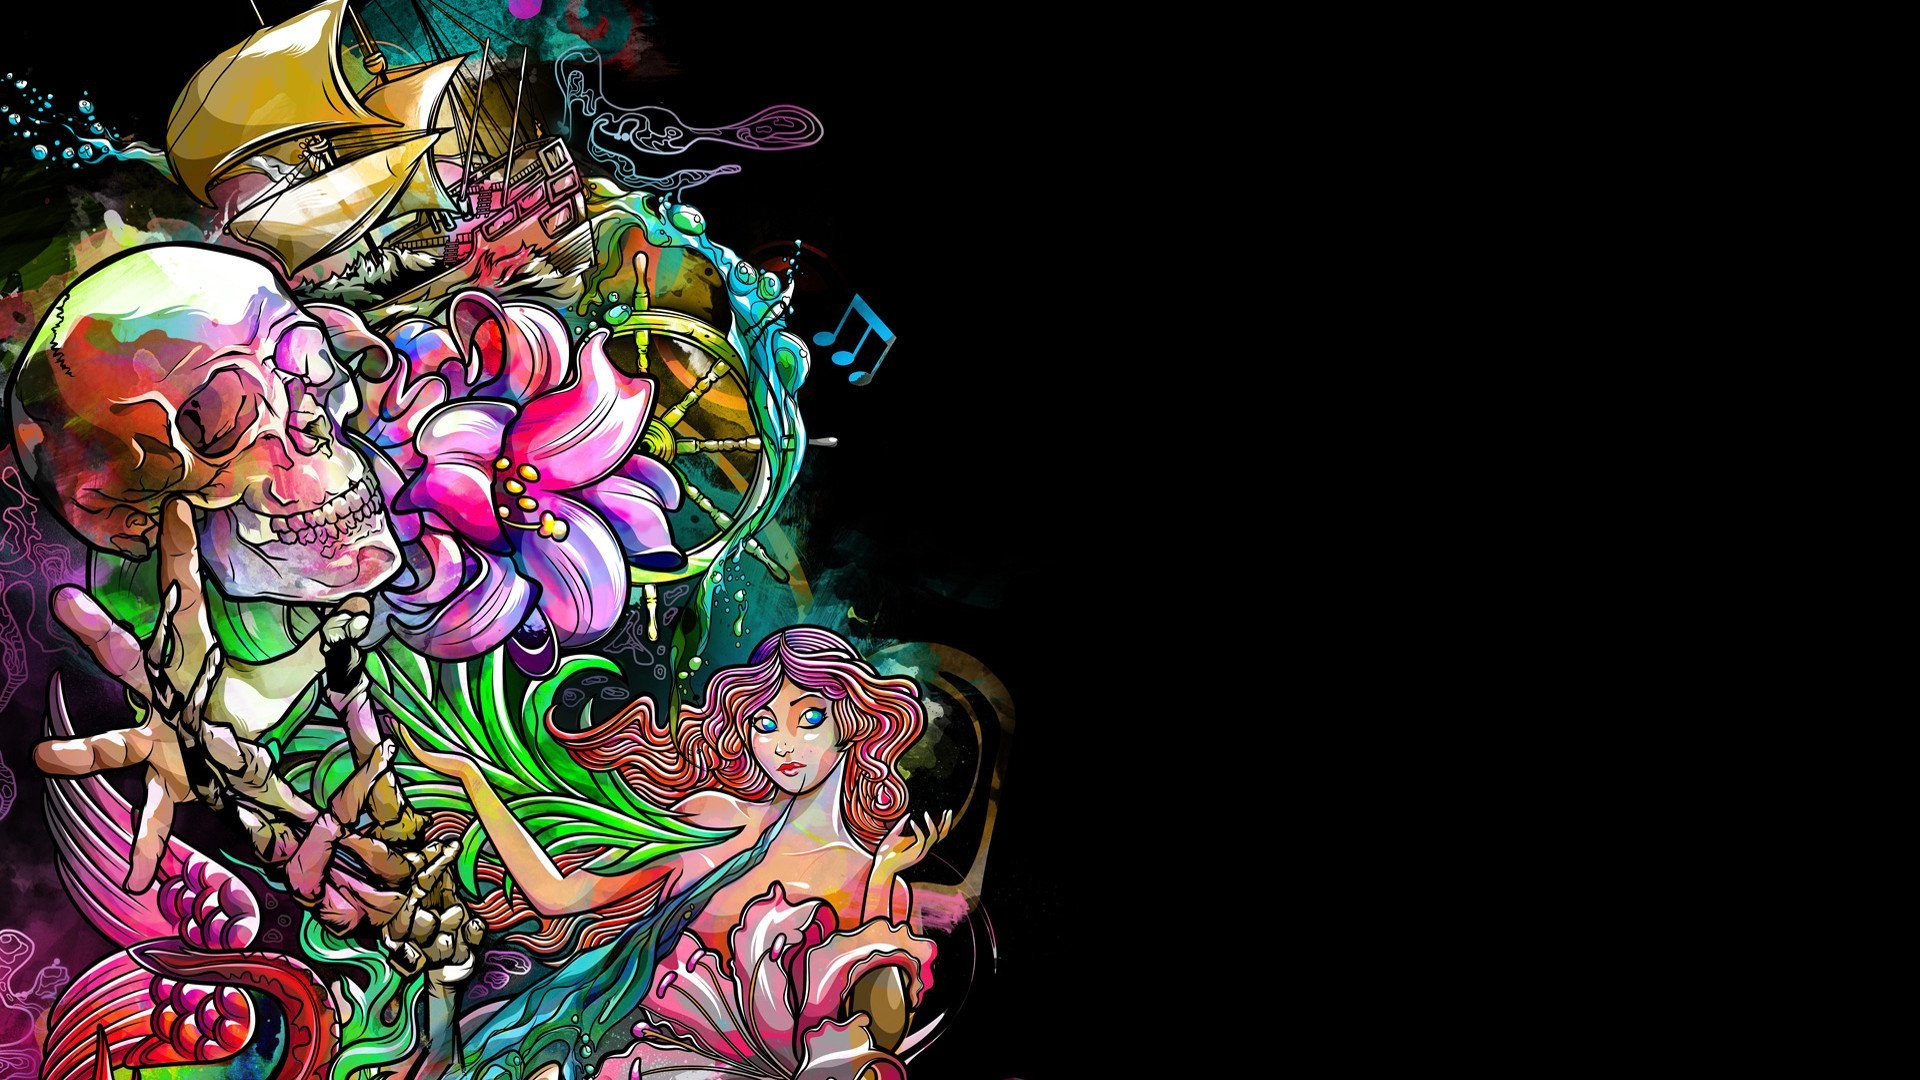 Res: 1920x1080, 3. japanese-flower-tattoo-wallpaper3-600x338